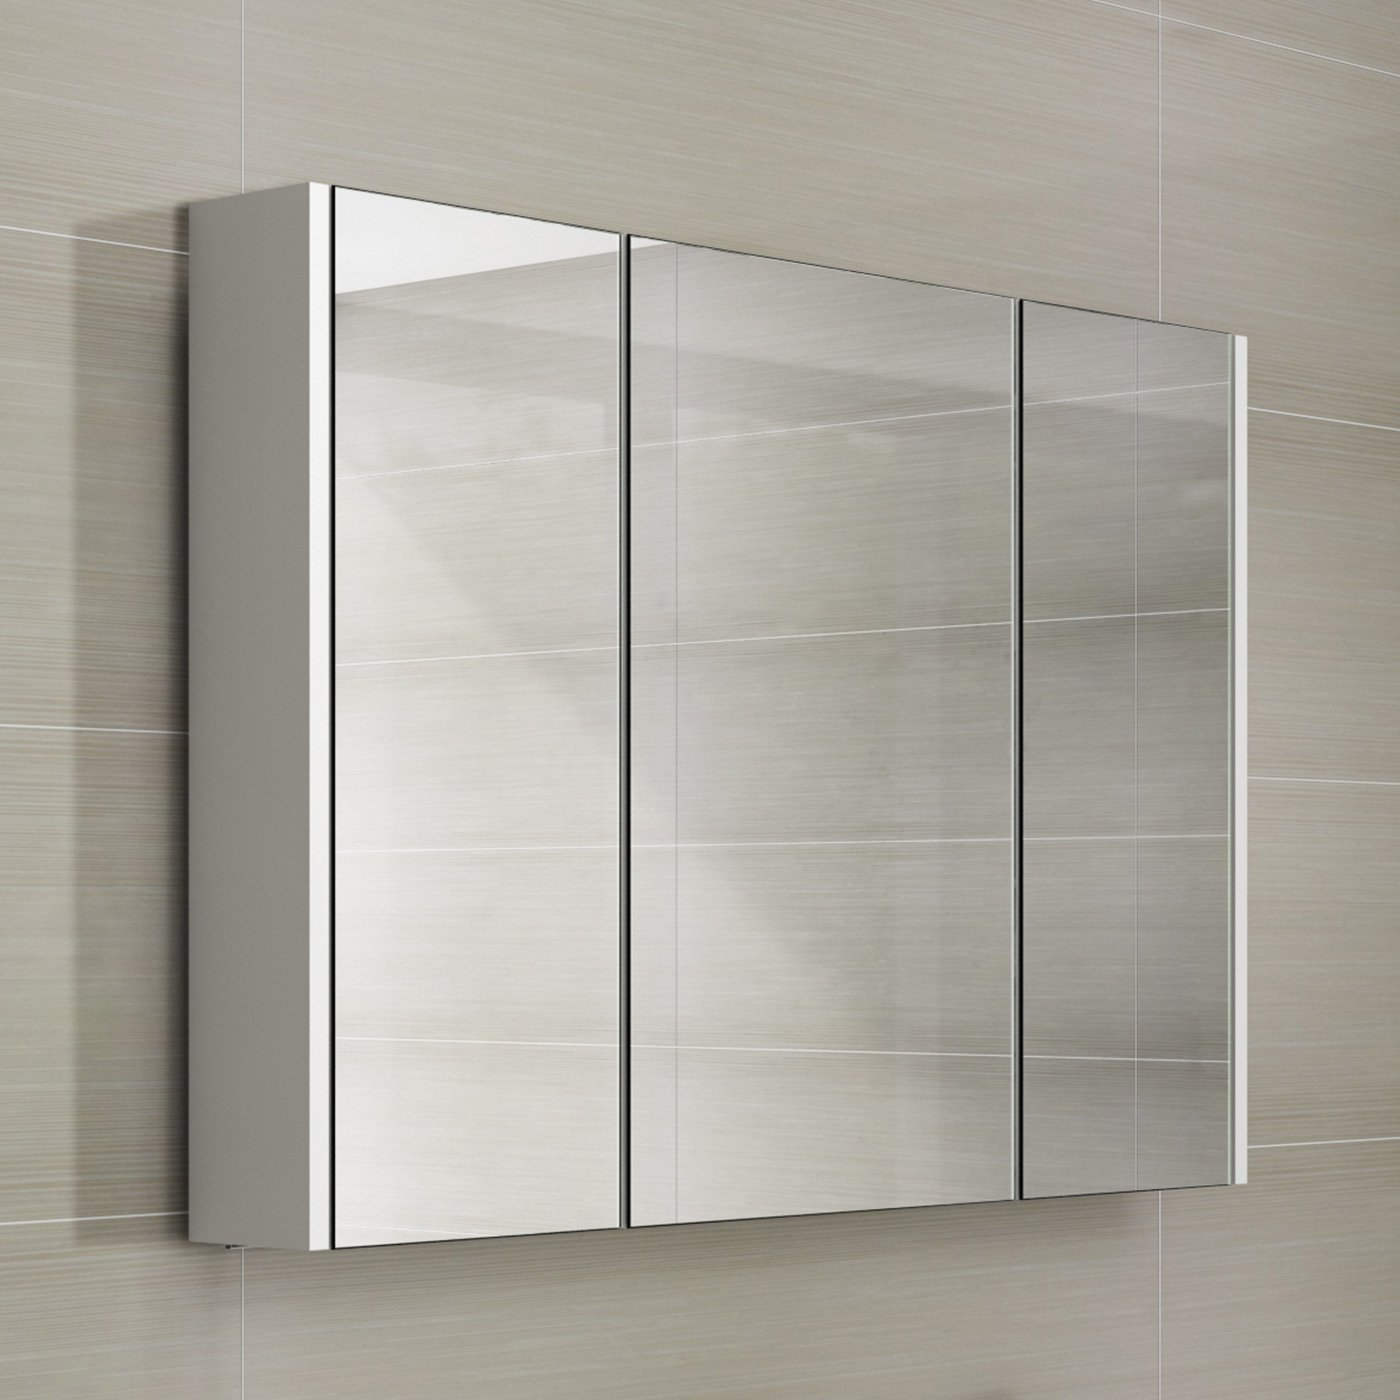 900mm White Gloss Wall Hung 3 Door Bathroom Mirror Cabinet Storage Unit iBathUK